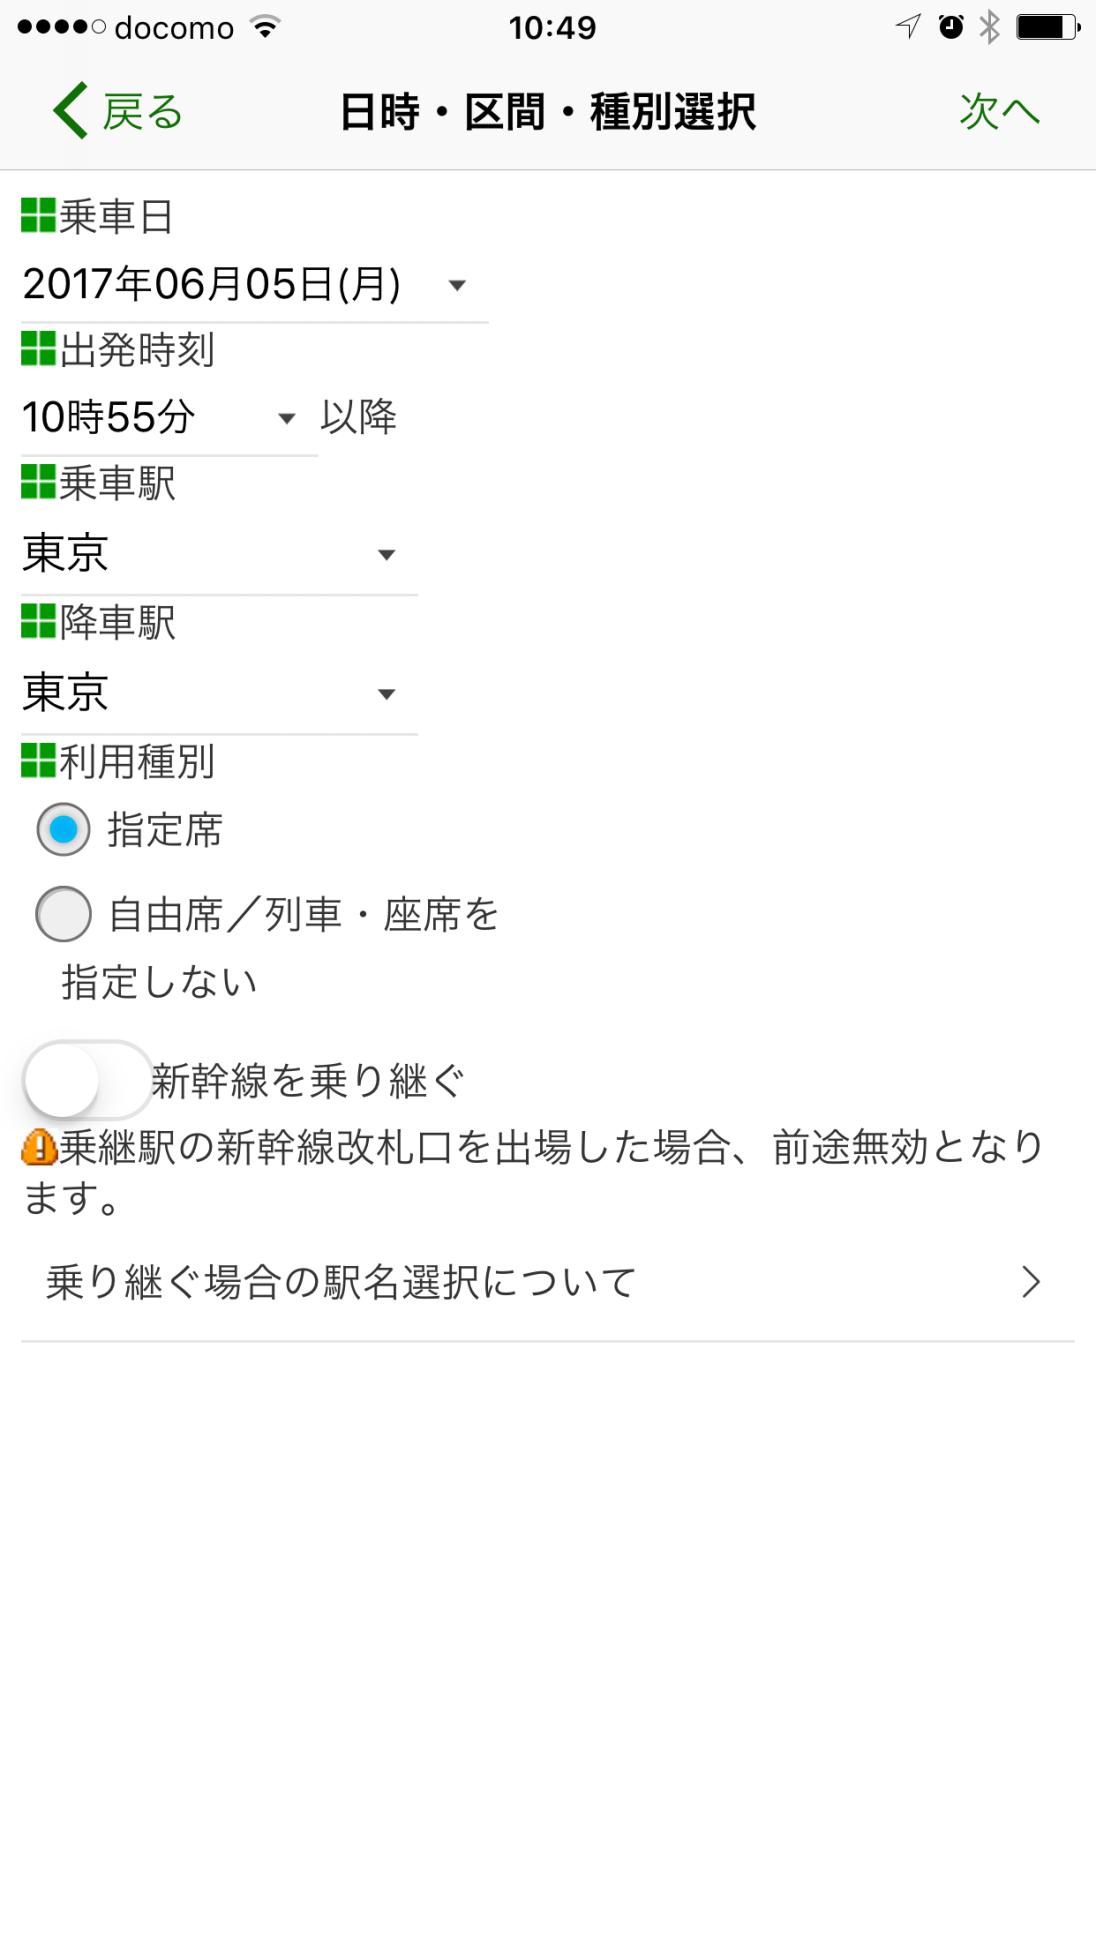 Select the Shinkansen station points